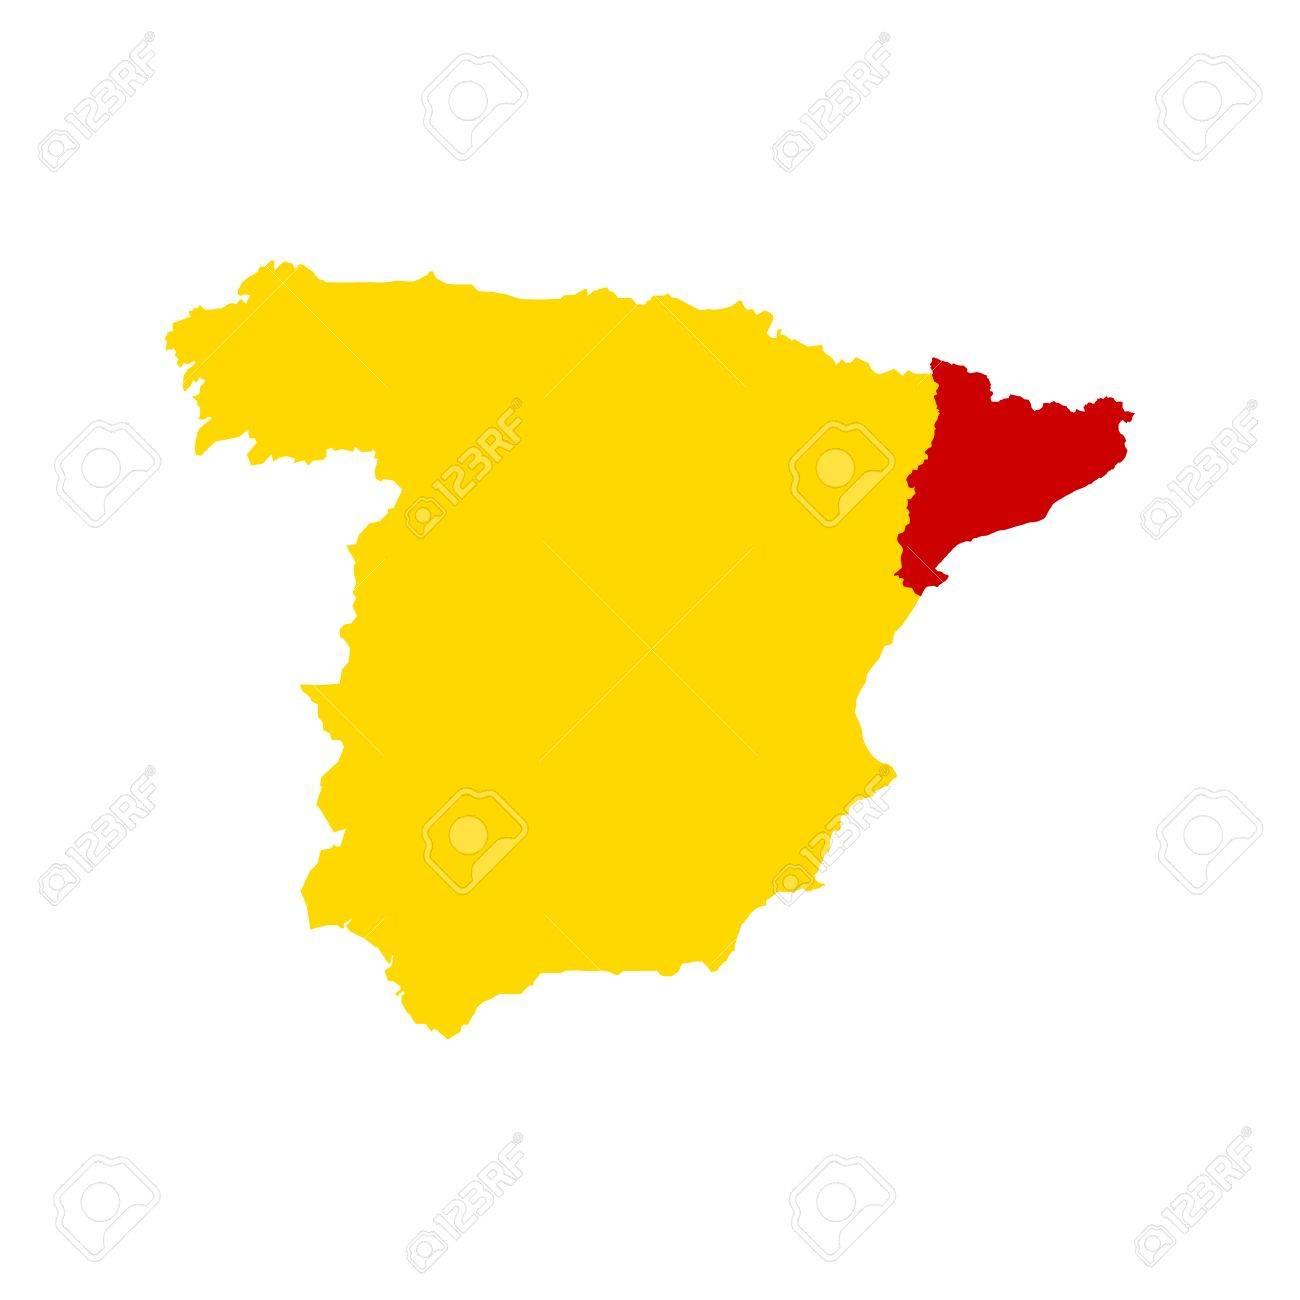 Spanien Katalonien Karte.Stock Photo